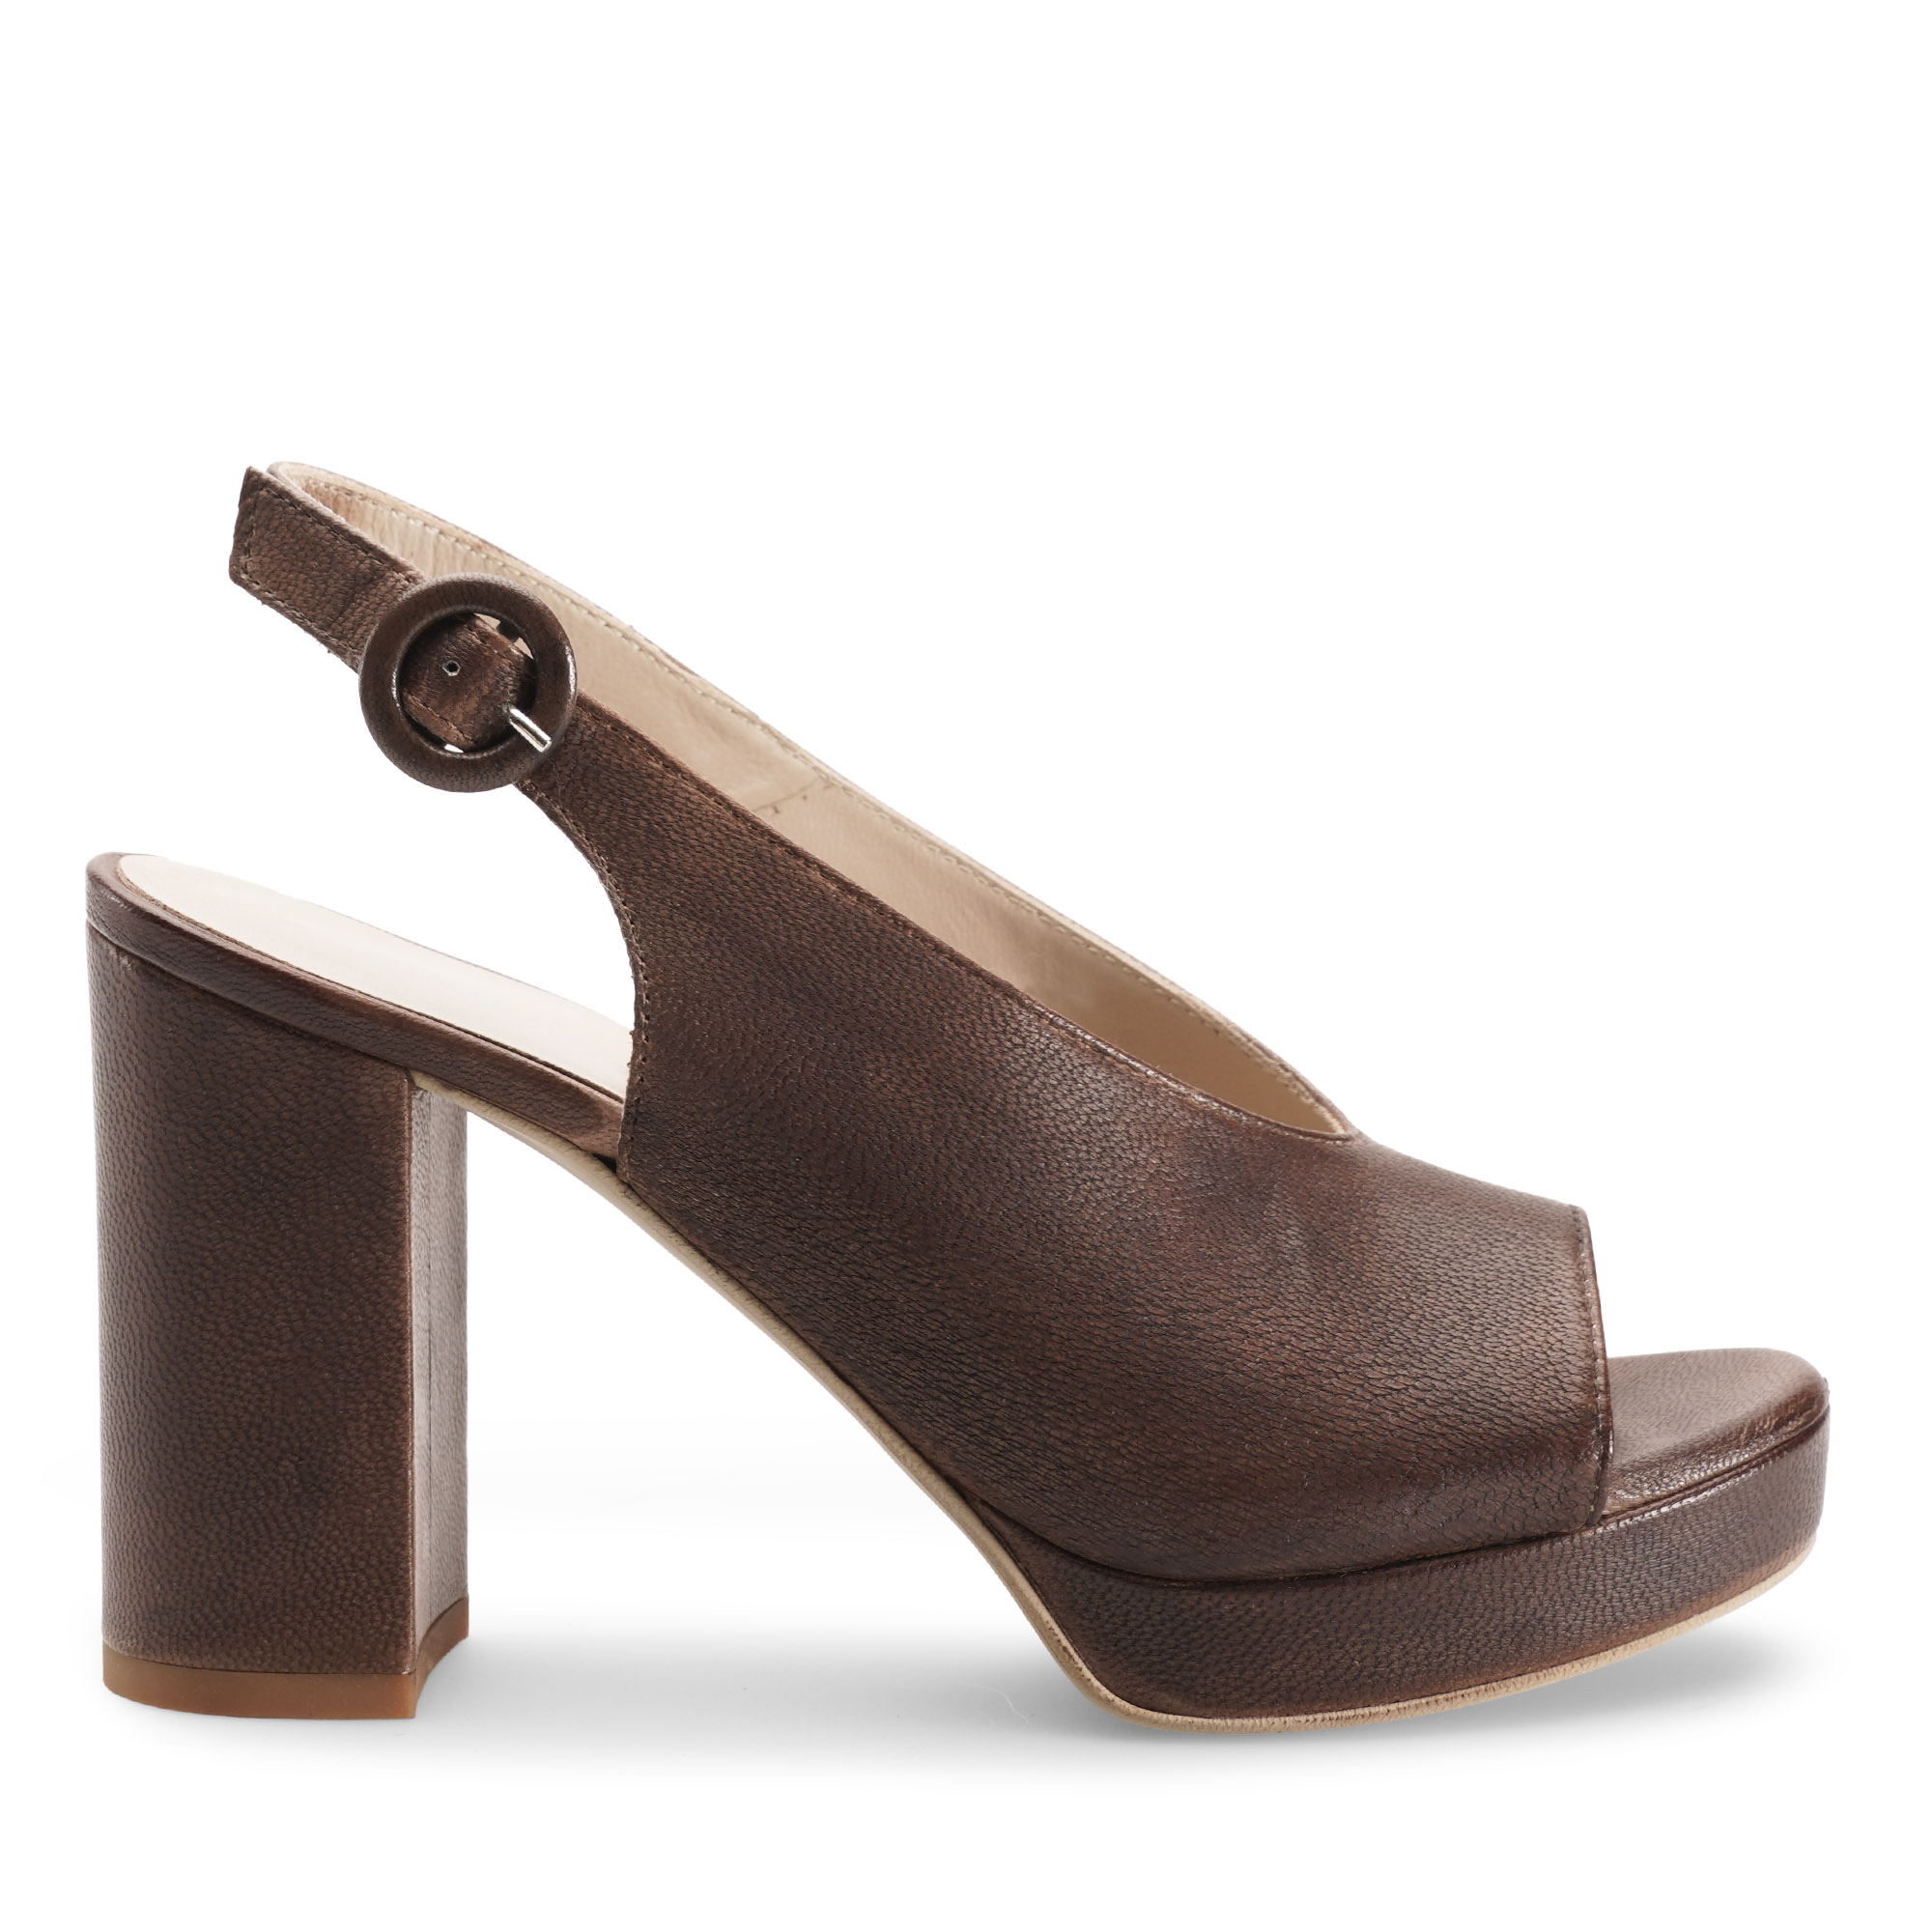 spuntata-marrone-pelle-chanel-emanuela-passeri-heels-shoes-spring-summer-2021